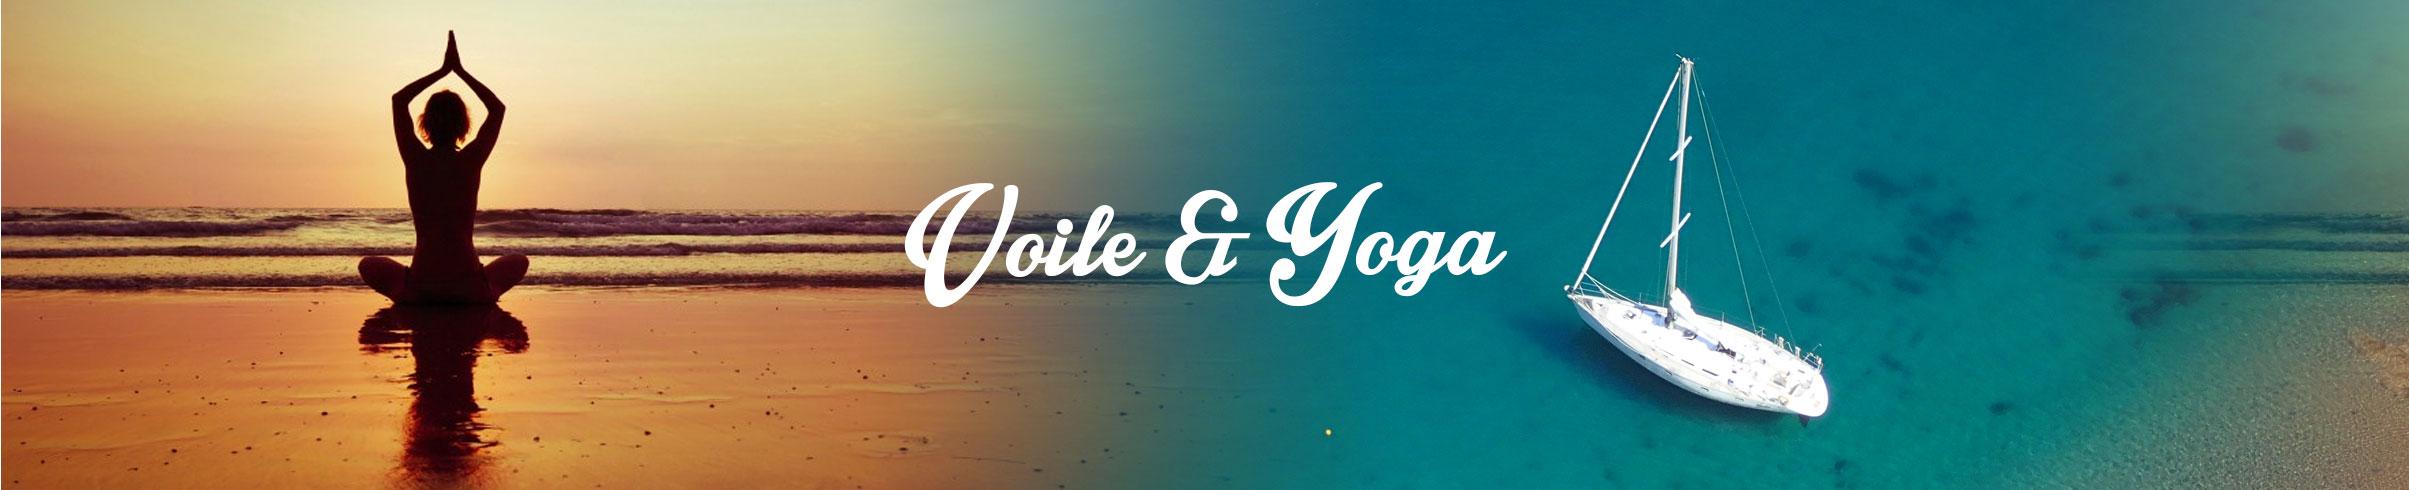 Voile & Yoga